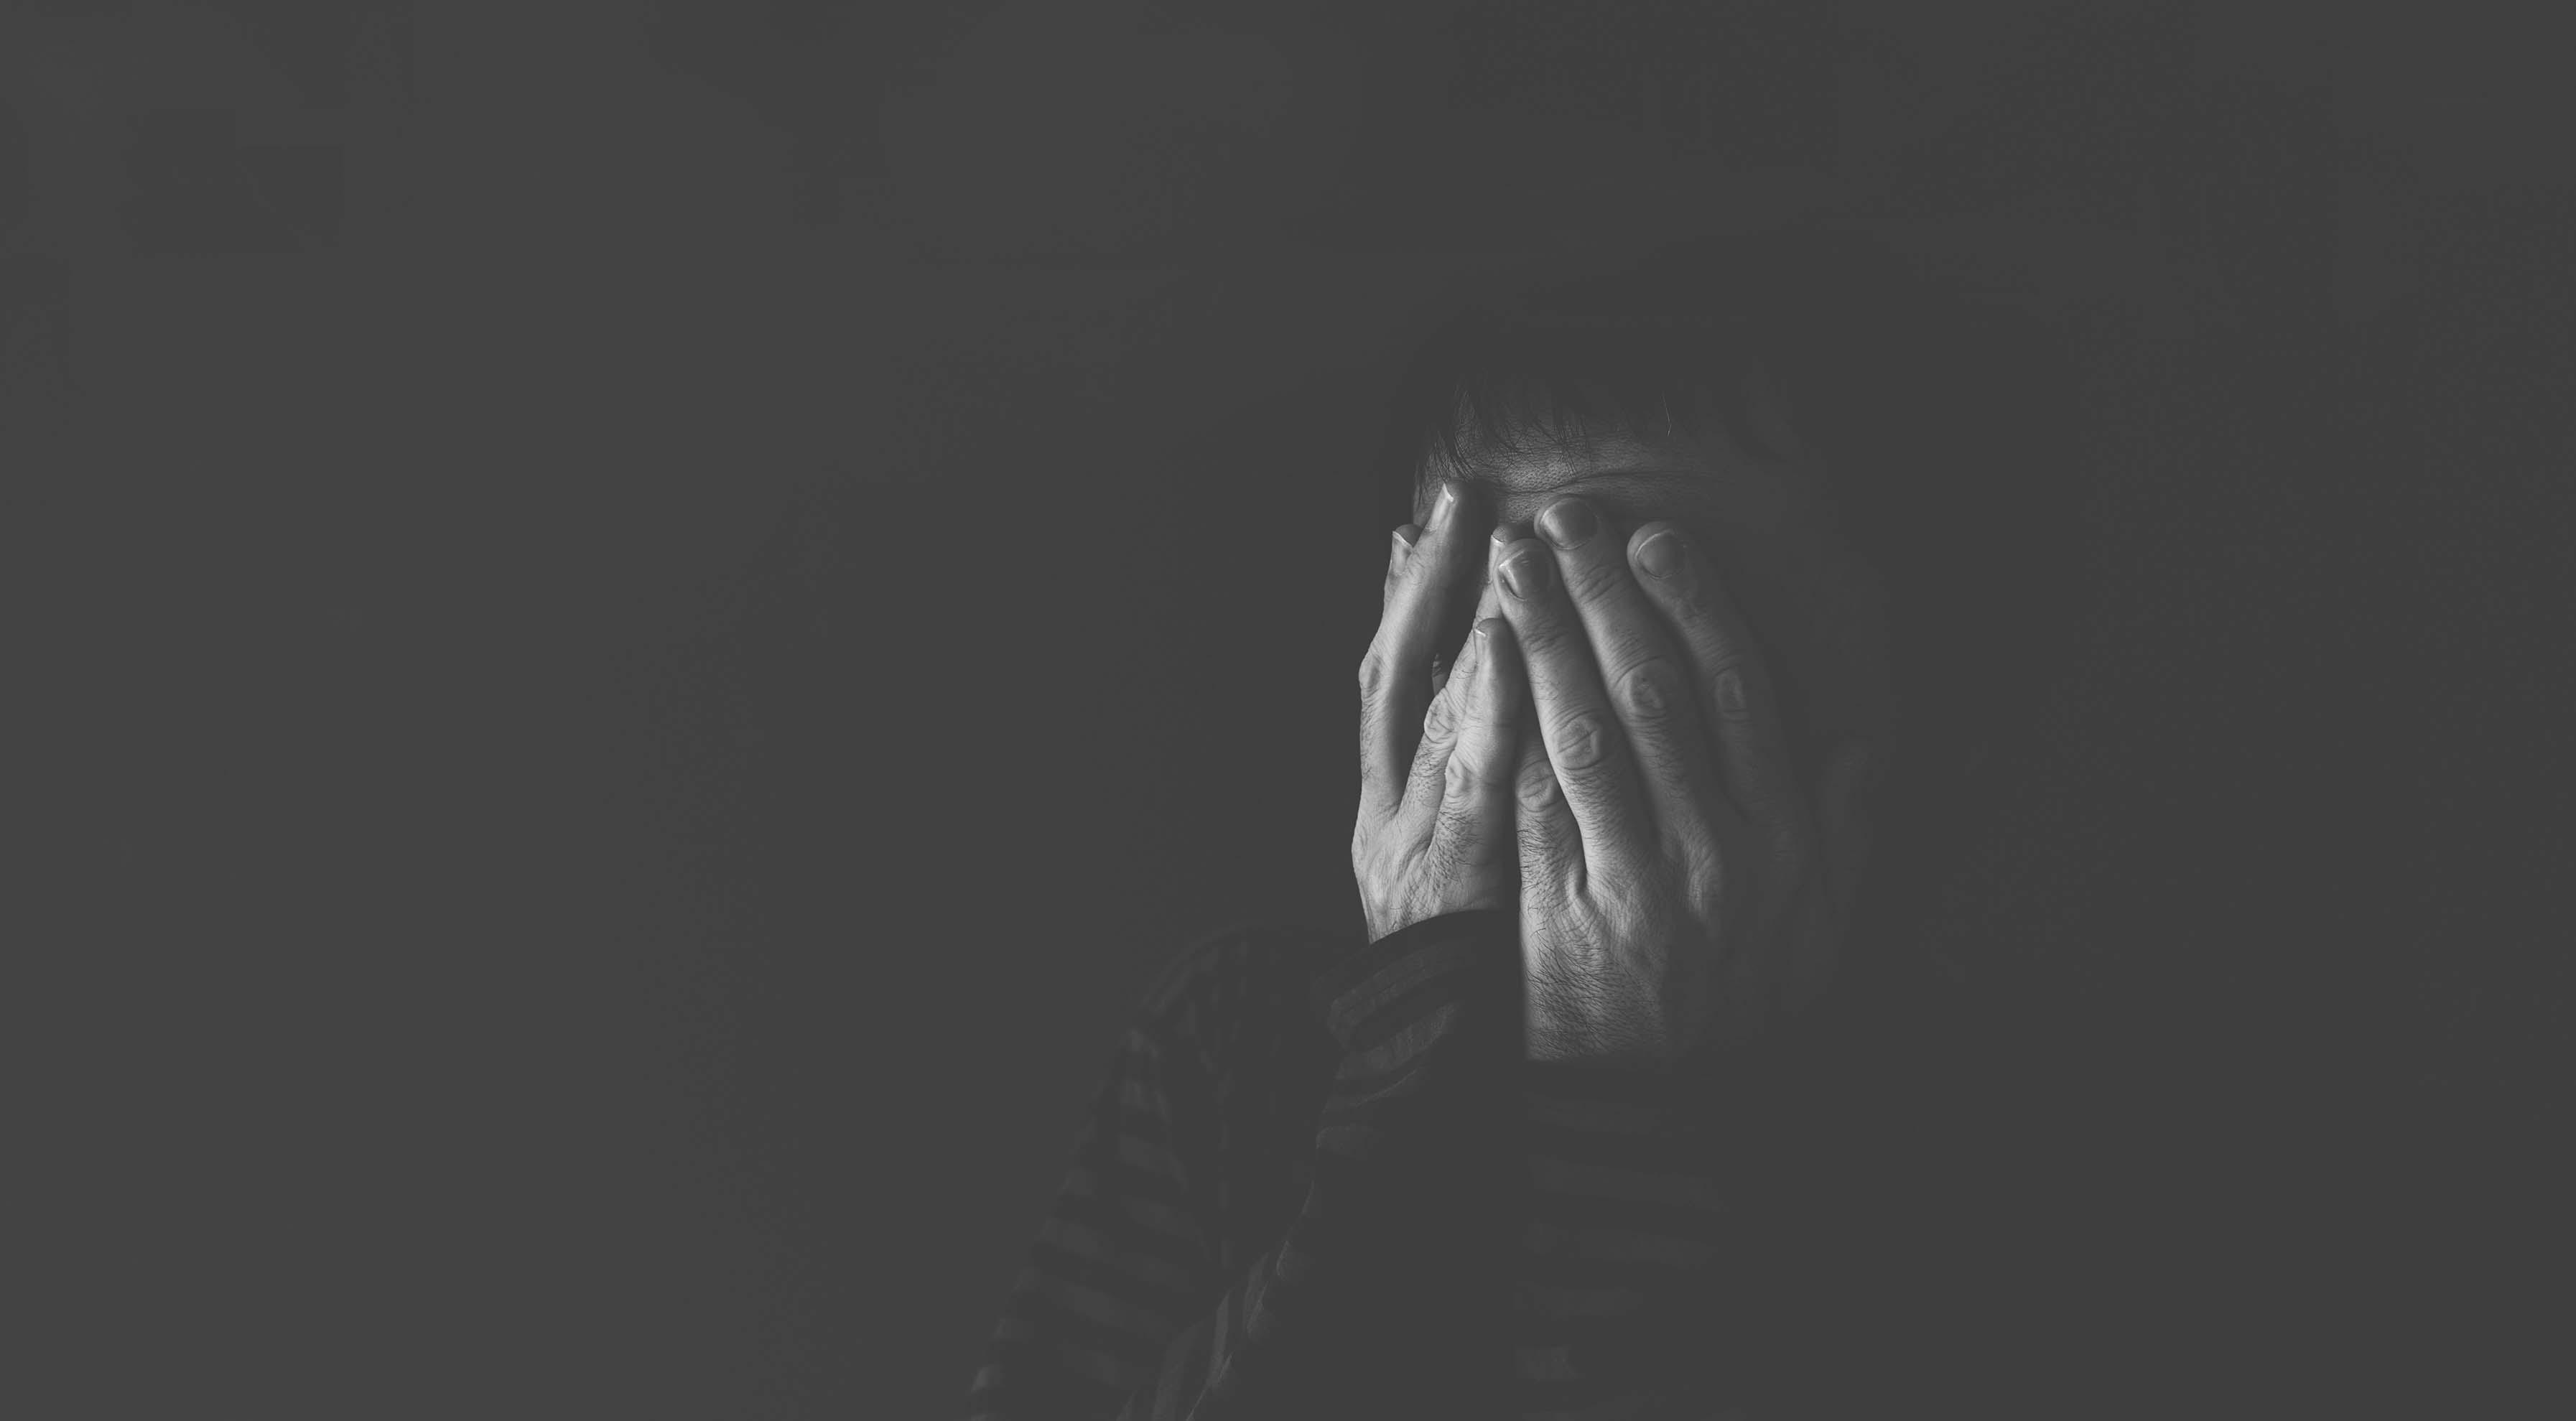 Why does depression happen? skc world